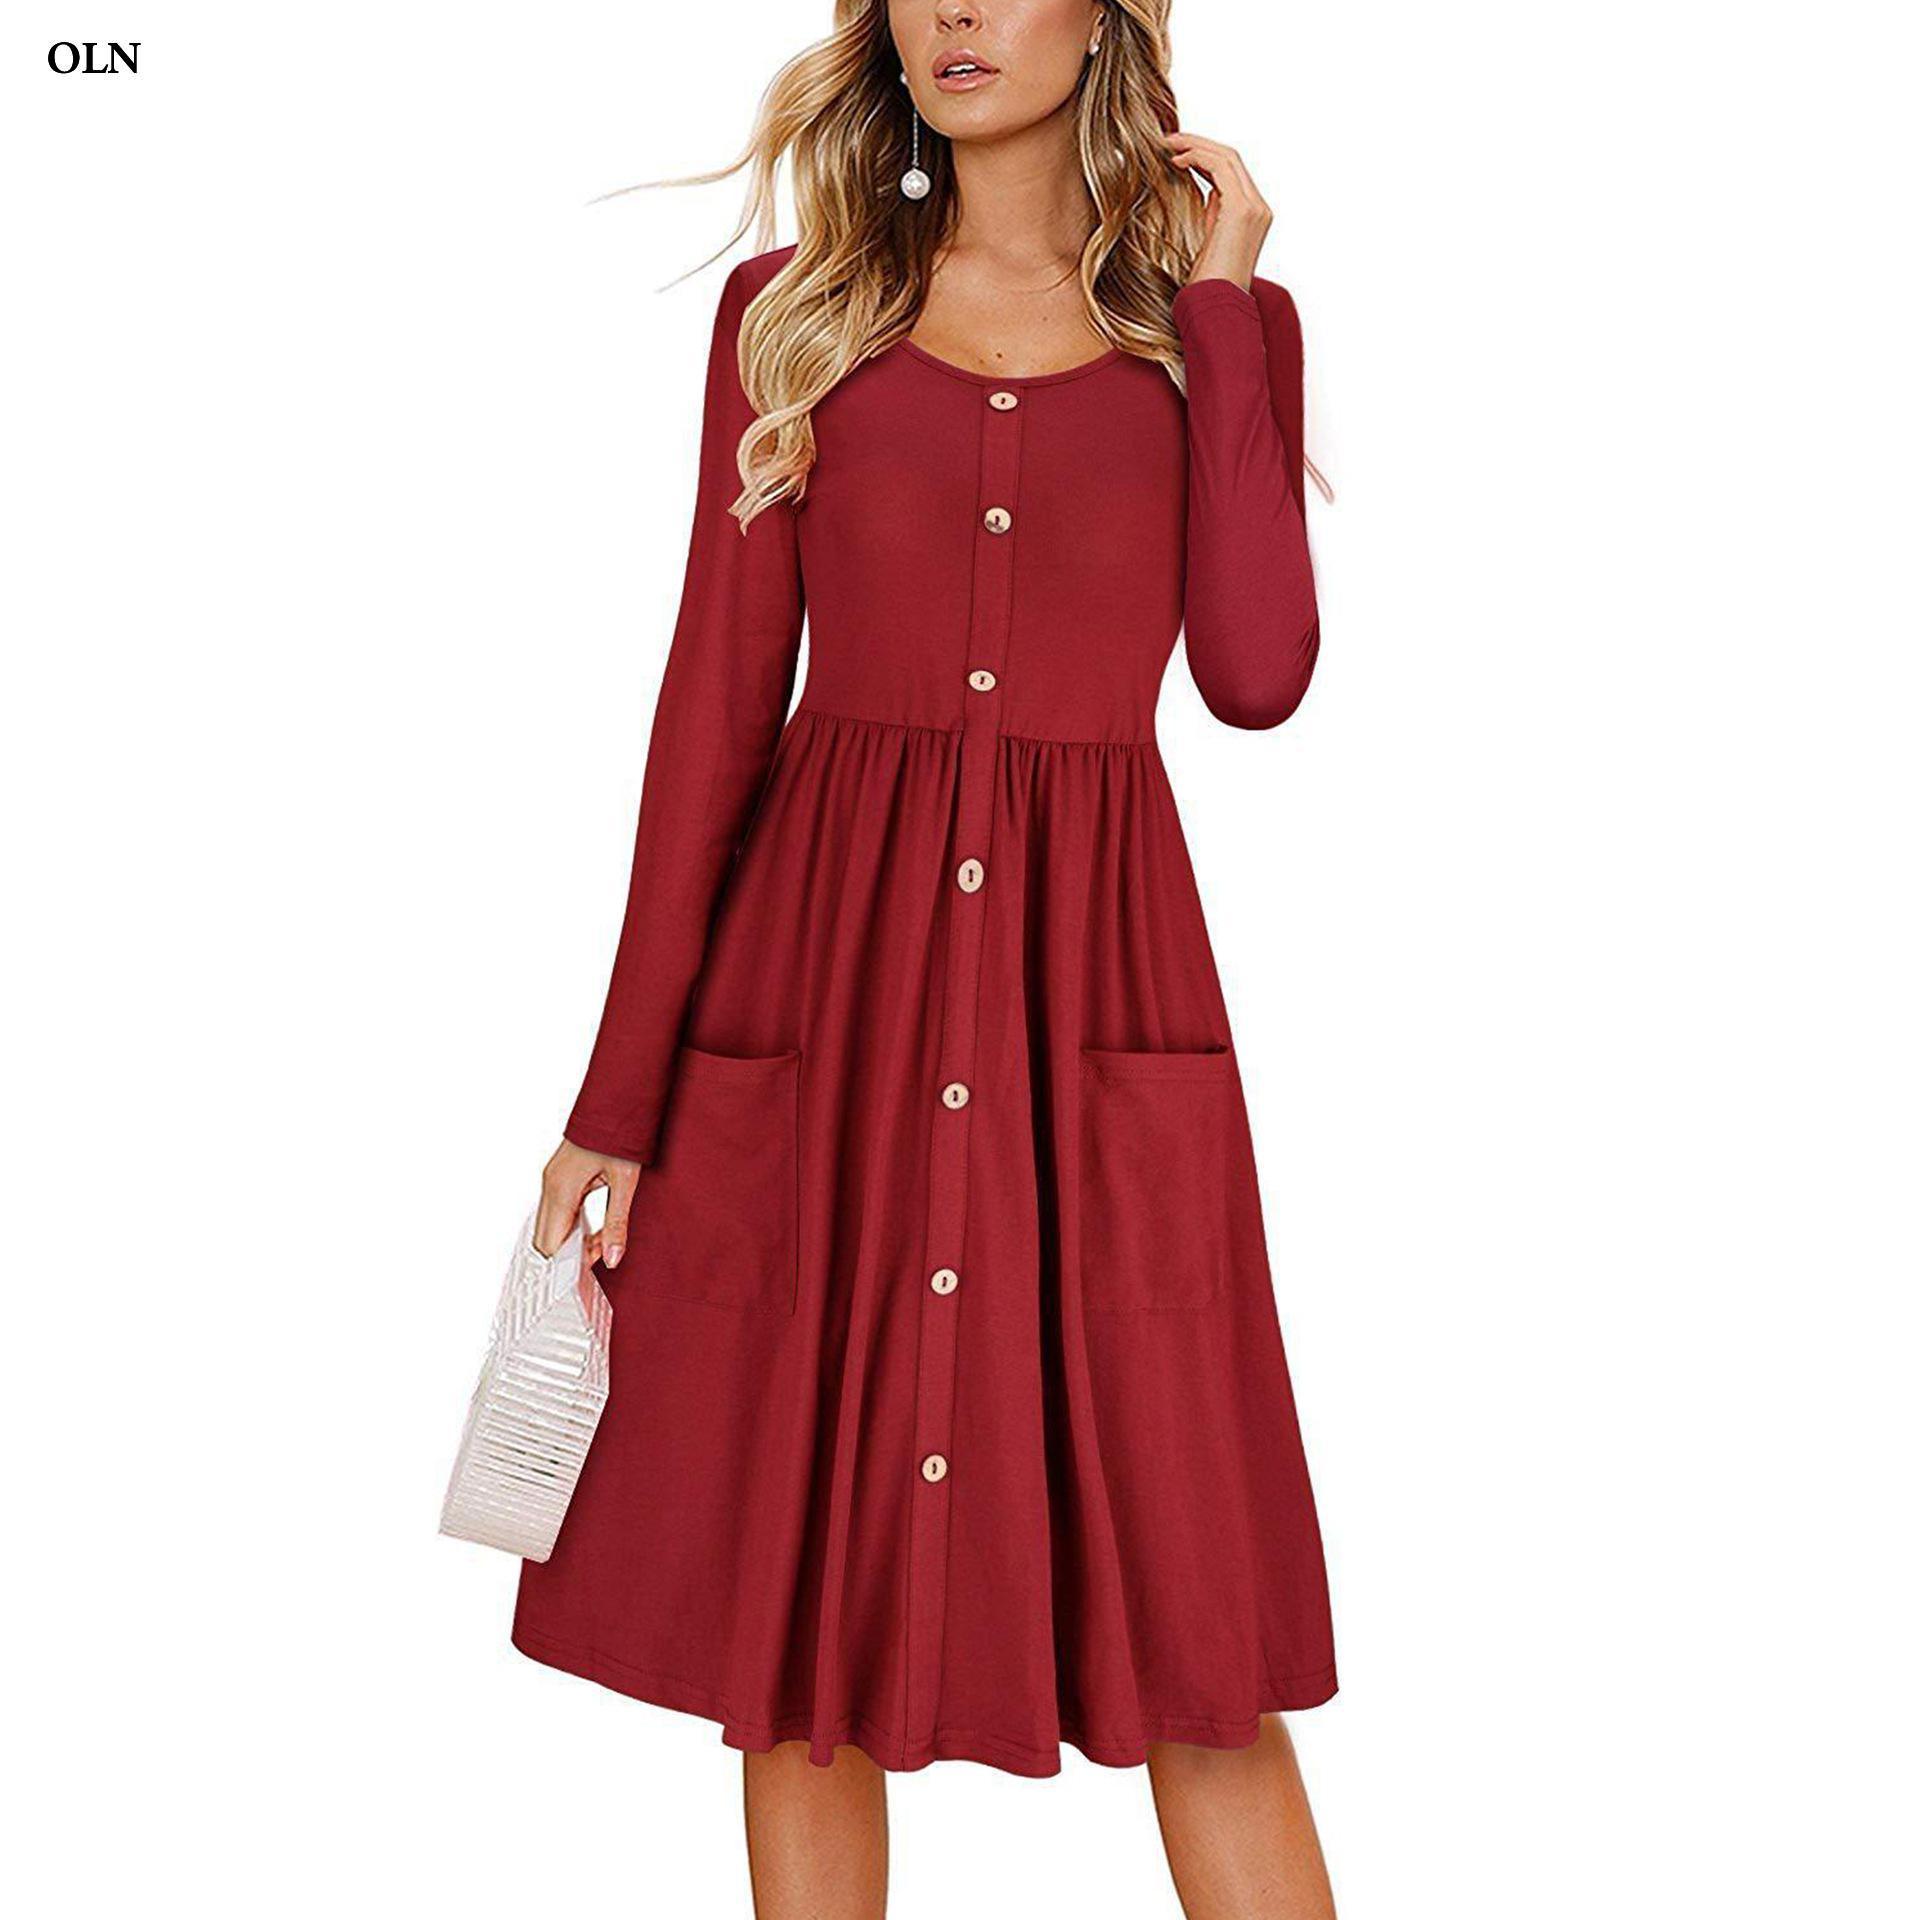 OLN Autumn Long Sleeve Casual Dress Women Victorian Bustle Dress Vintage